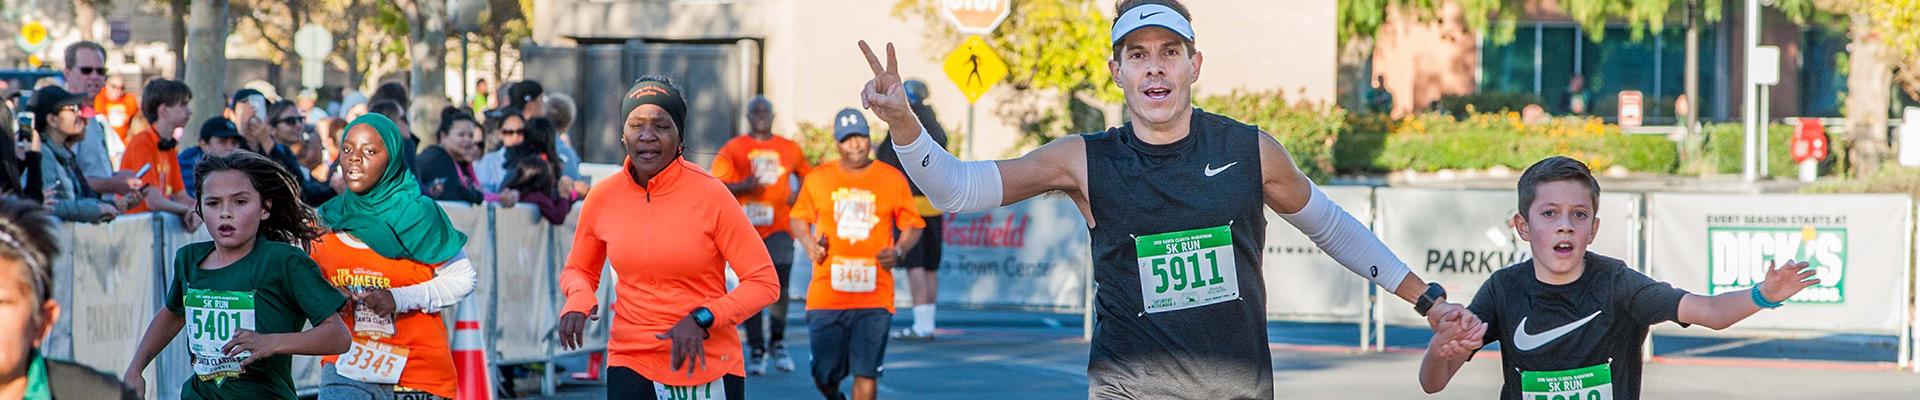 santa clarita marathon coupon code 2019